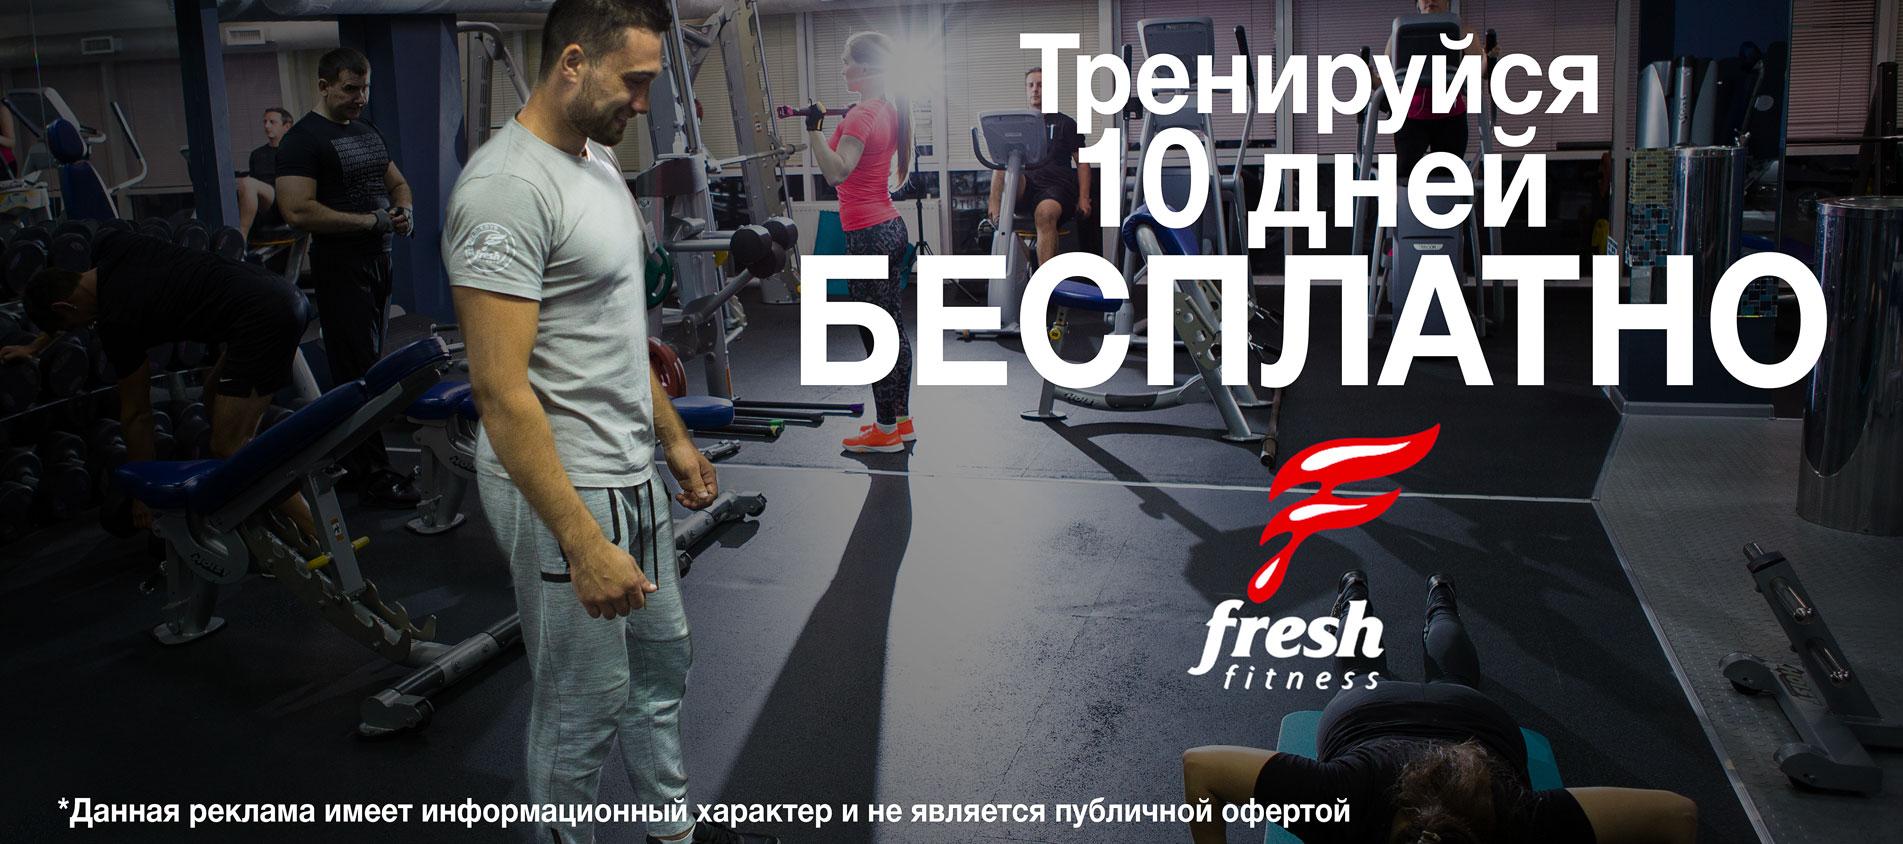 10dfree